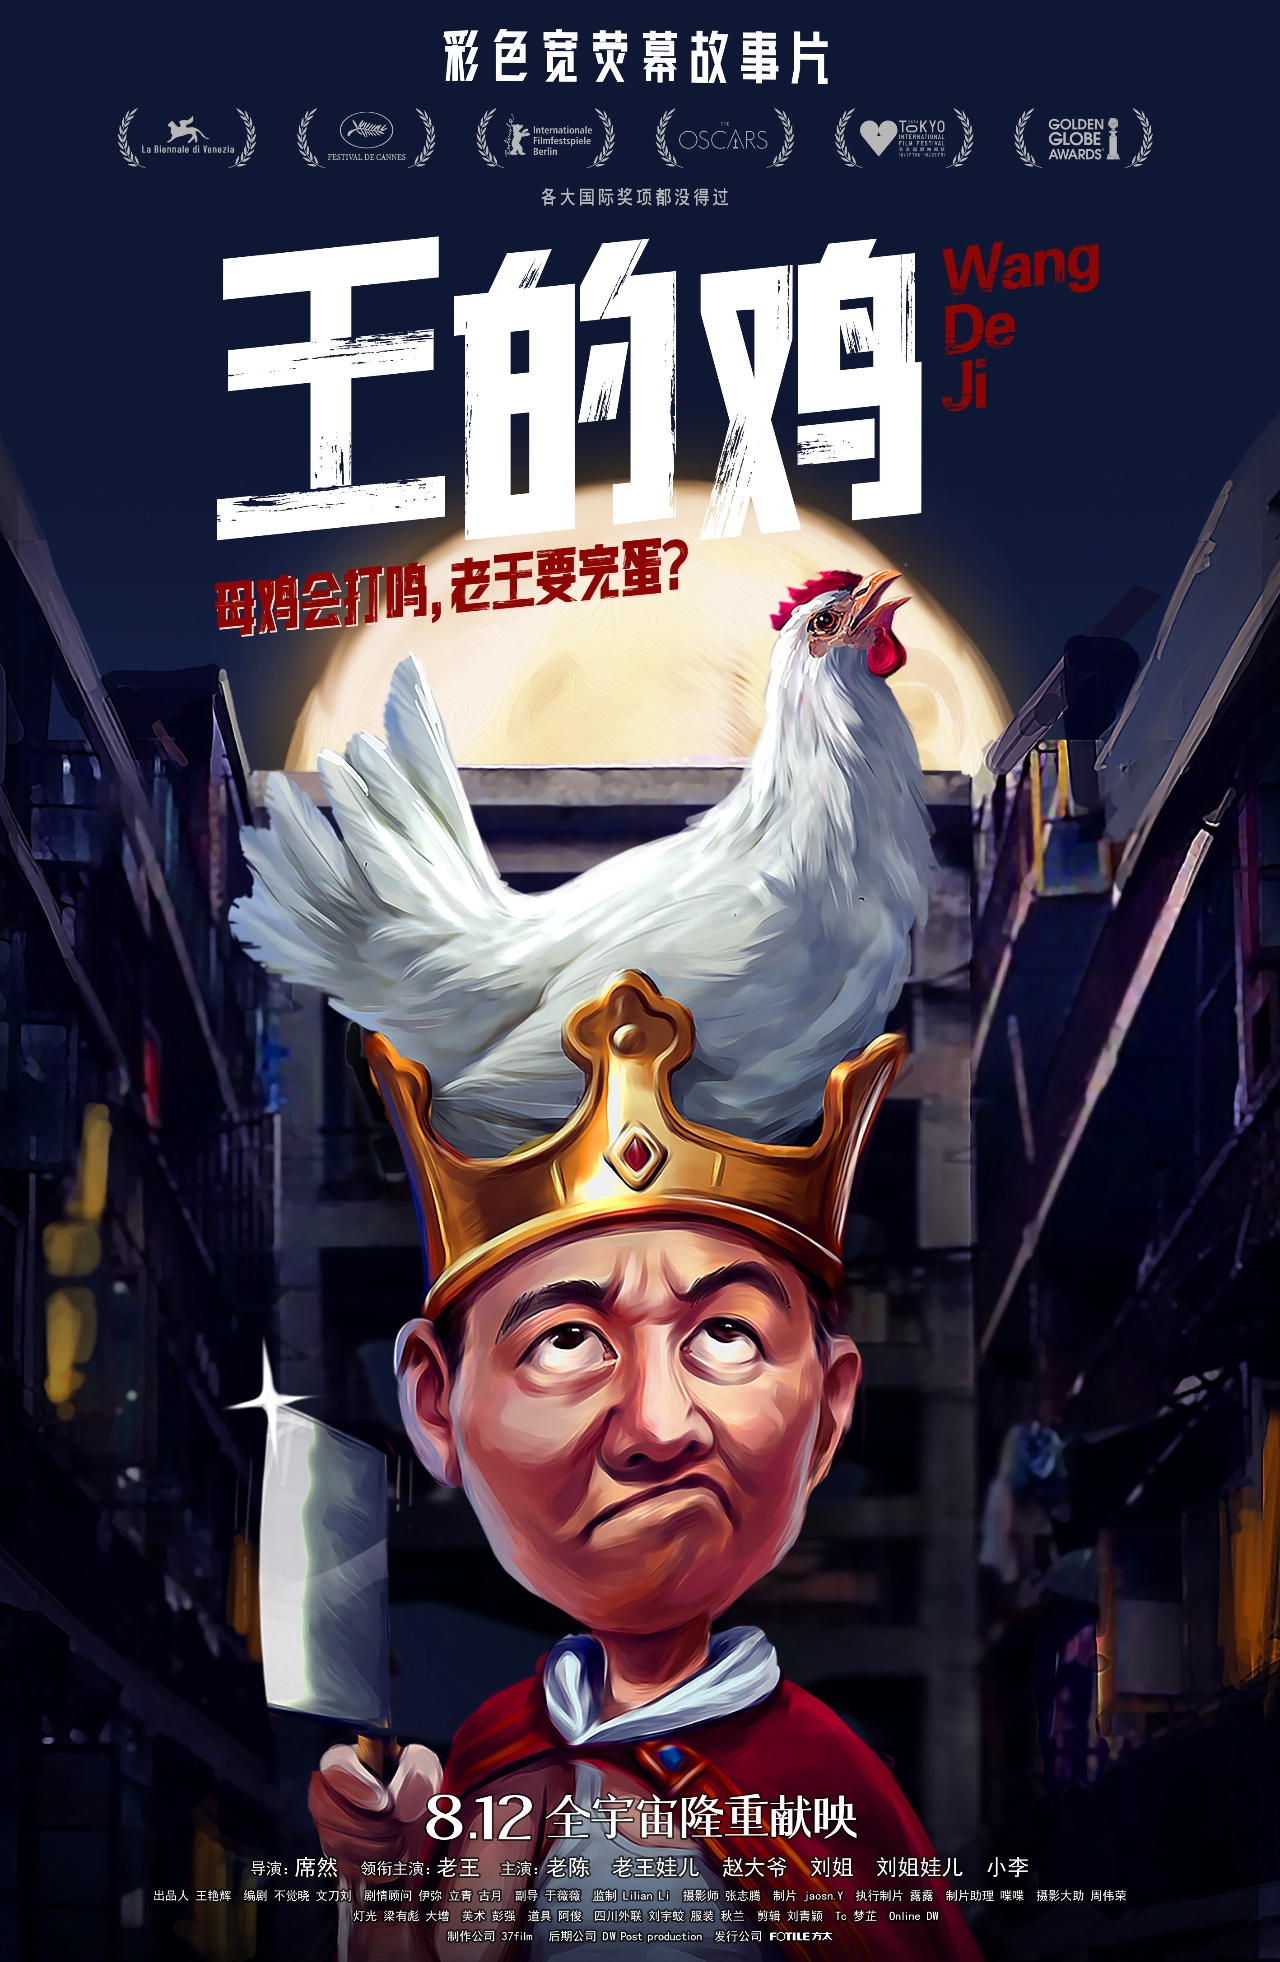 方太品牌故事王的鸡